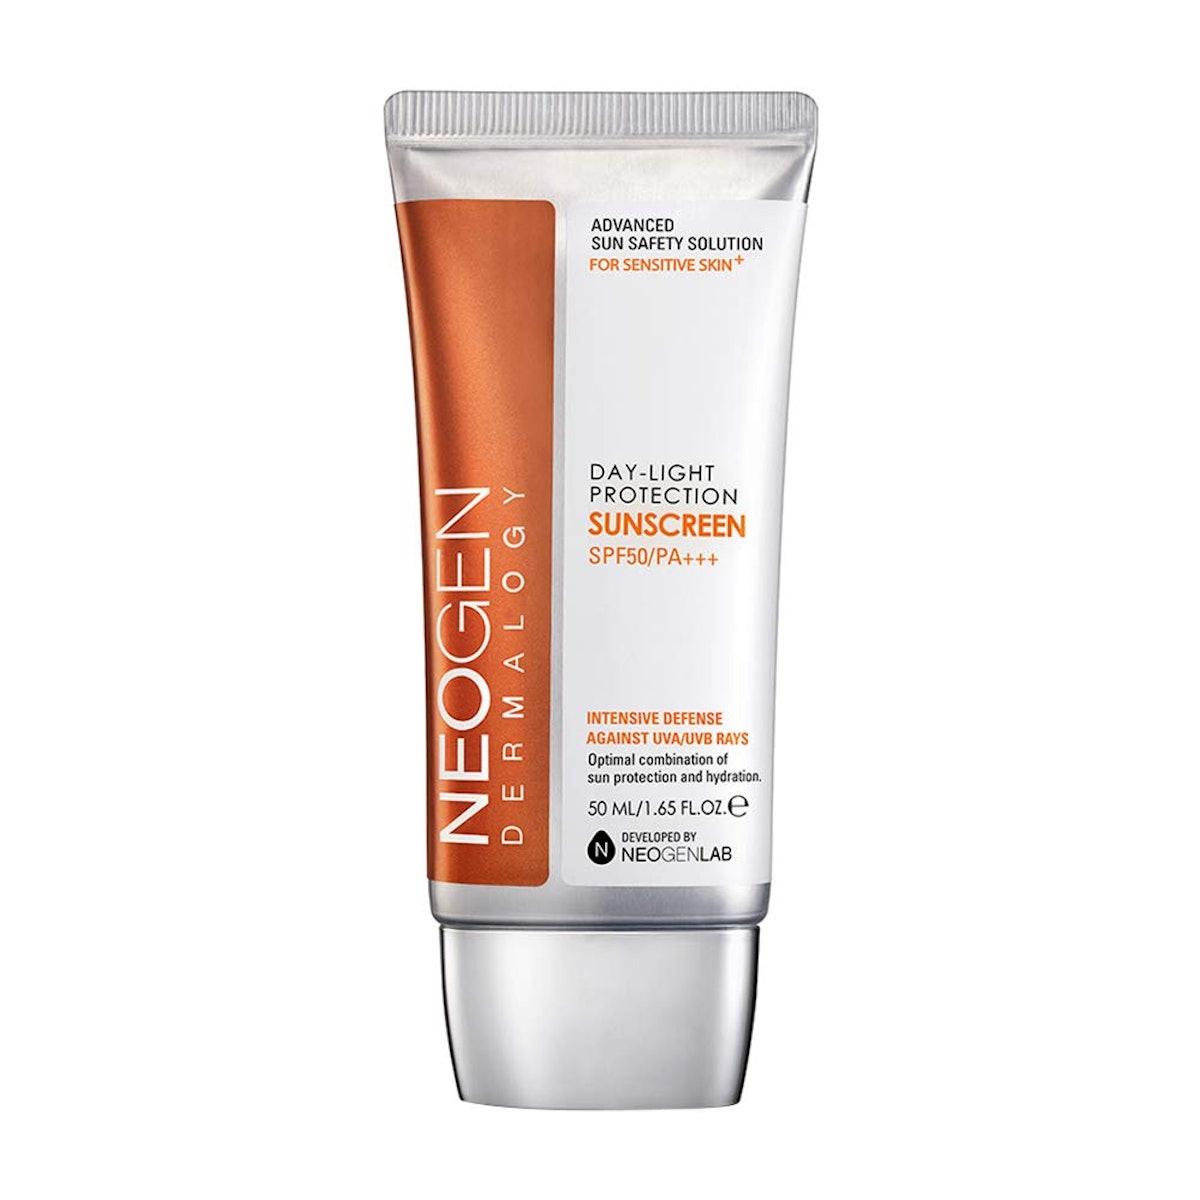 Neogen Dermalogy Day-Light Protection Sunscreen SPF 50/PA+++